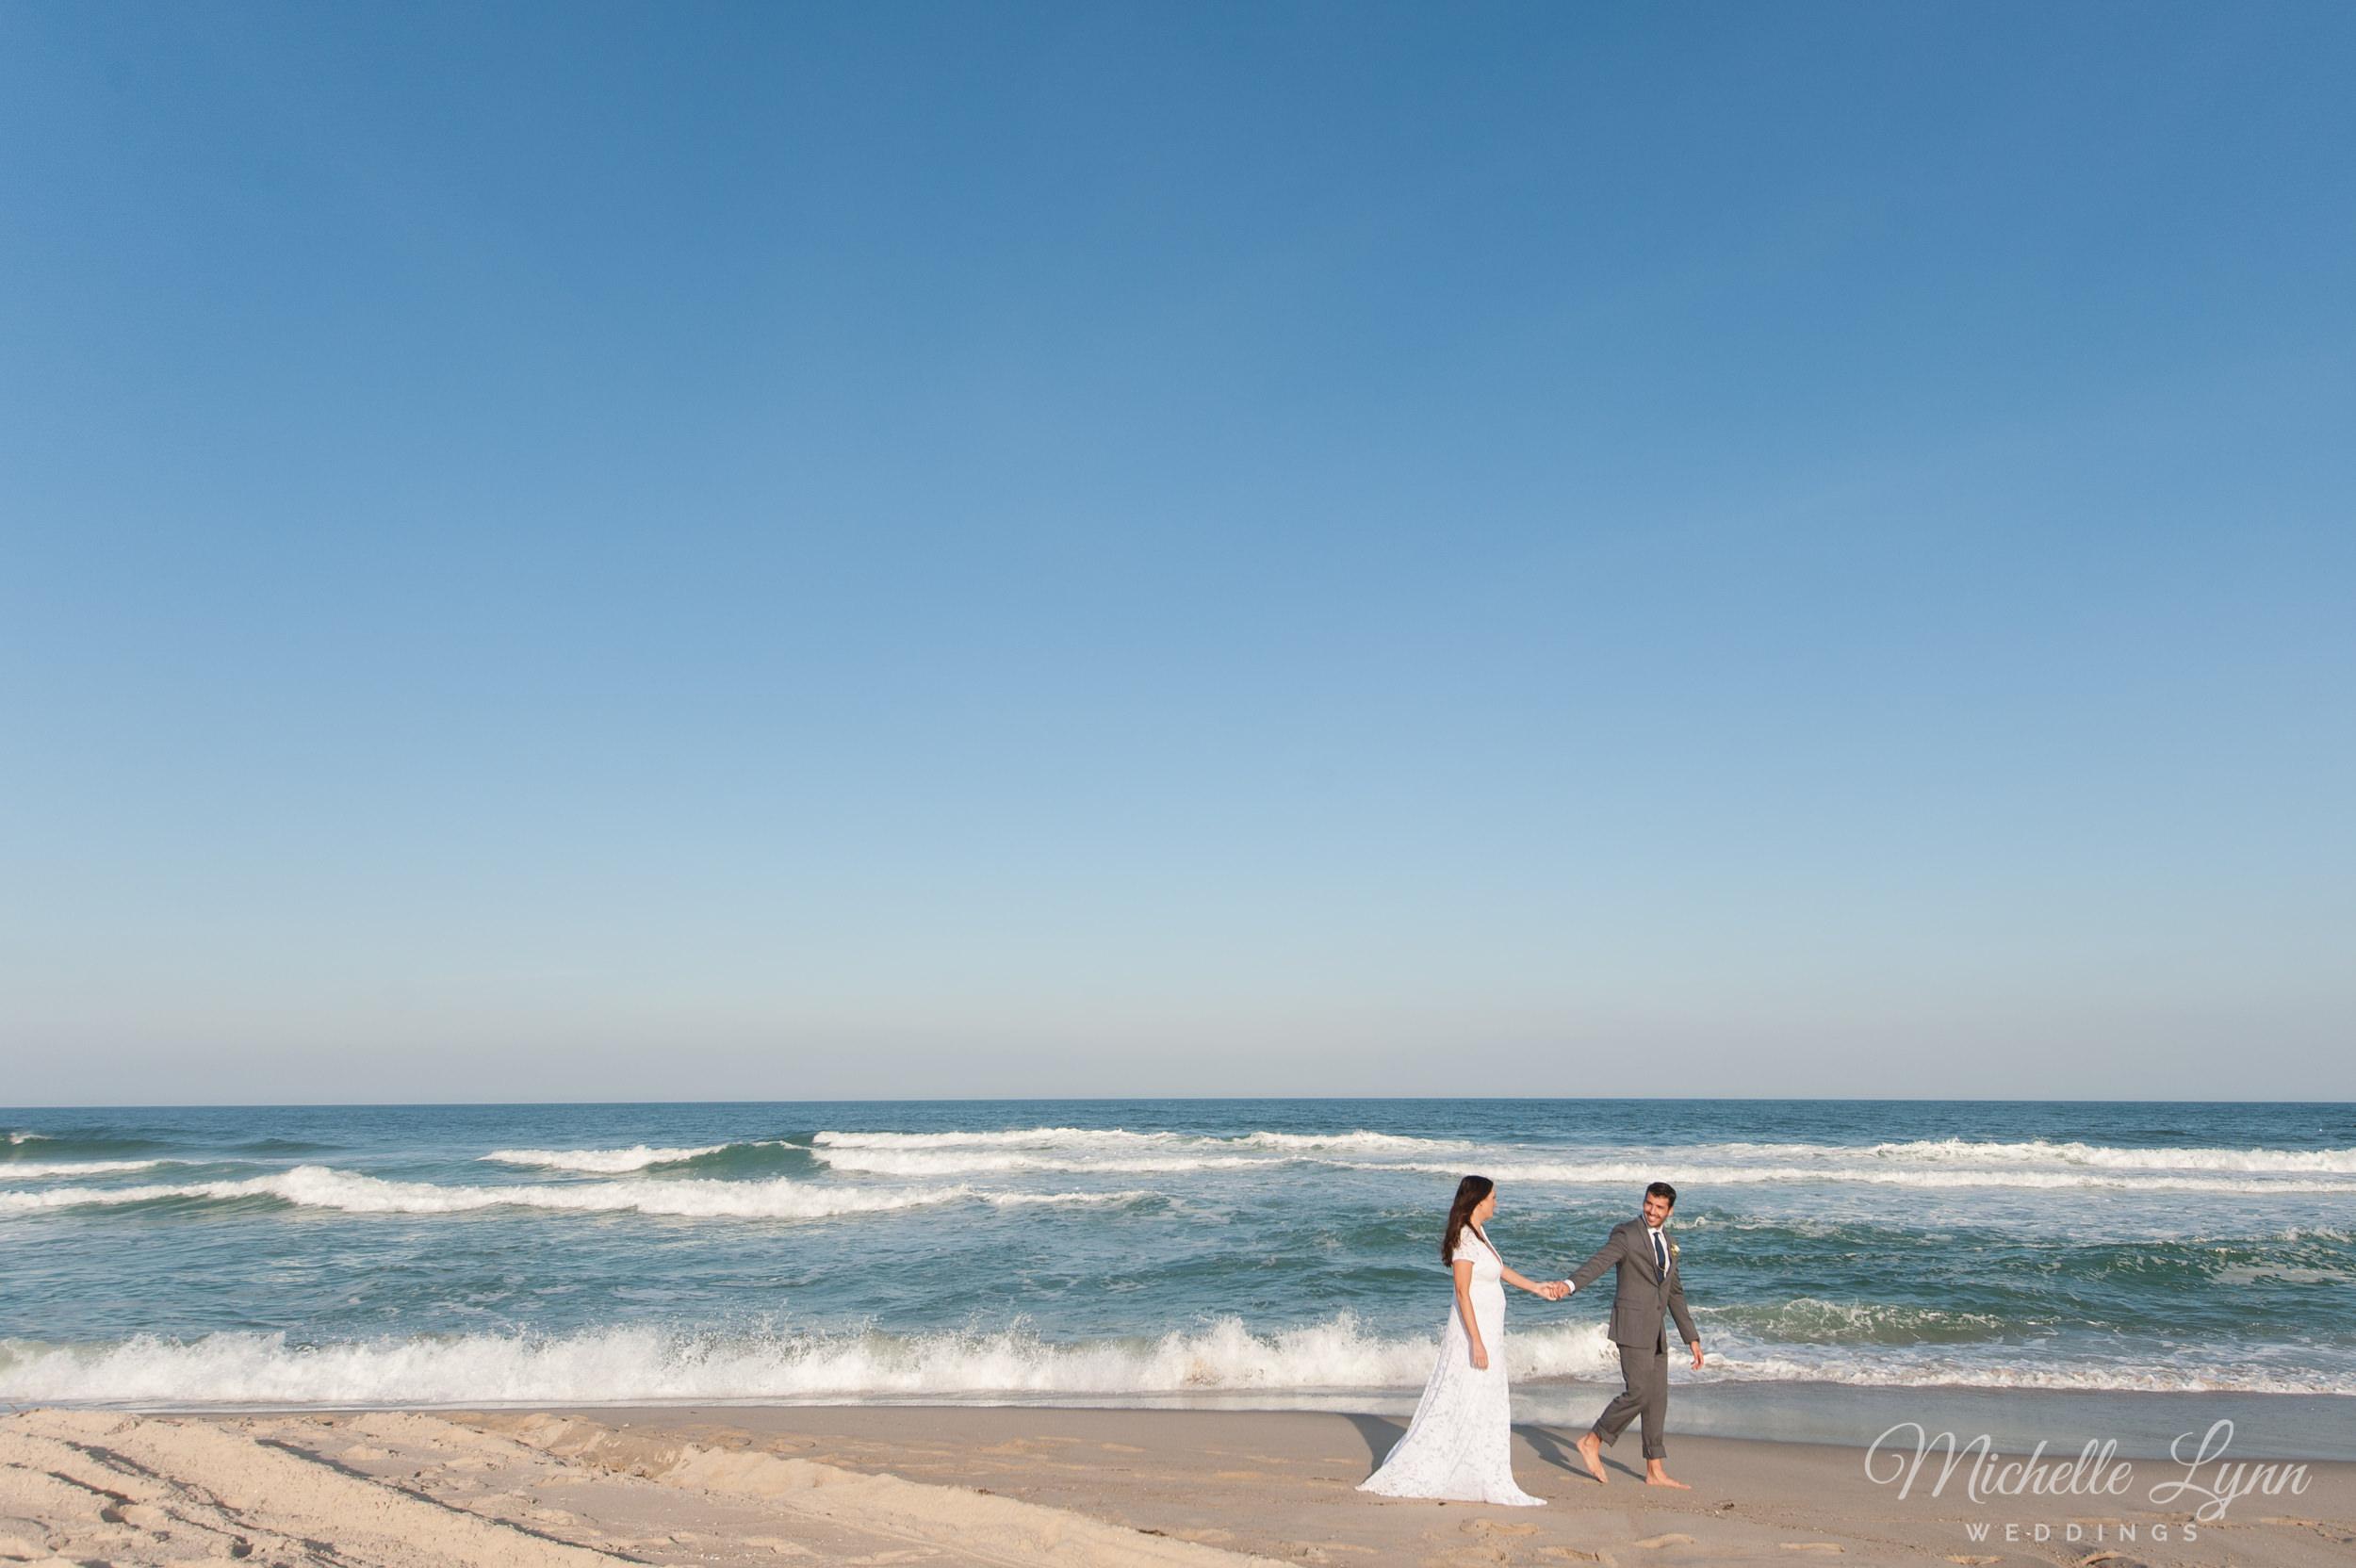 mlw-long-beach-island-new-jersey-wedding-photography-10.jpg